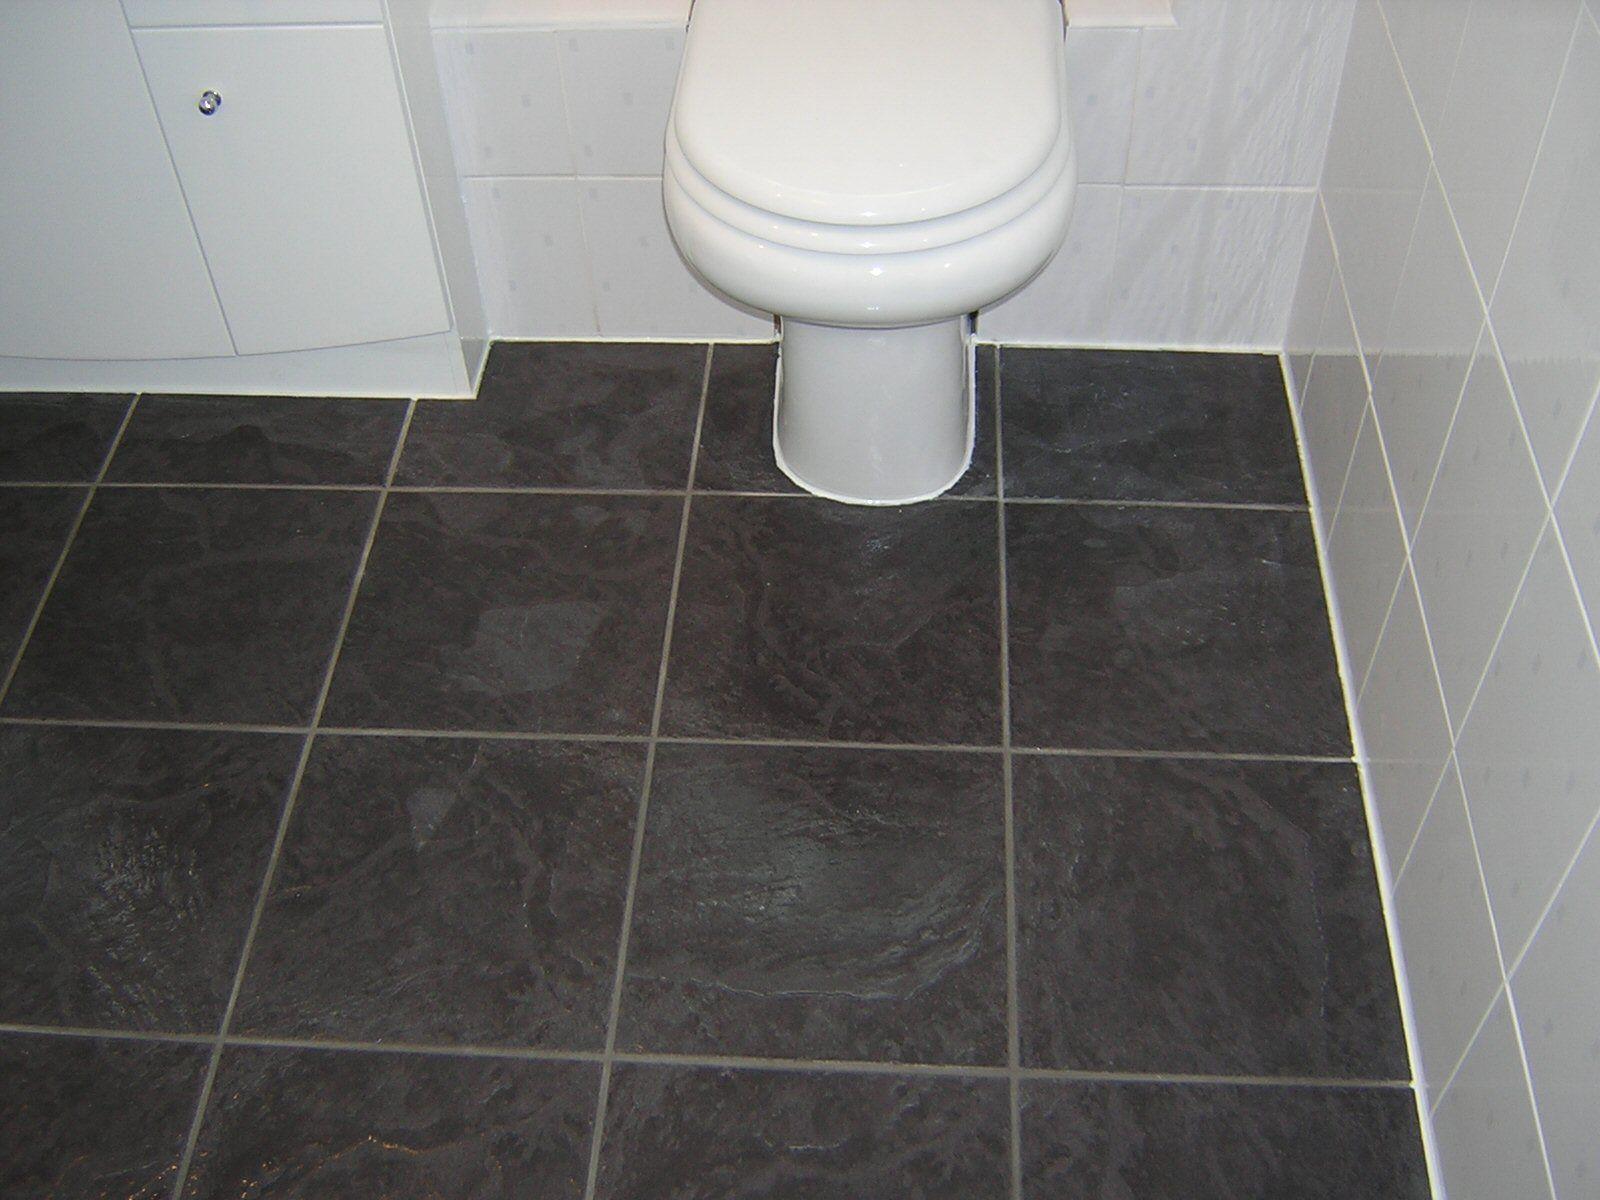 Ikea Bathroom Floor Pretty Bat And Cabinet Wall Ideas Epoxy Paint Ideal Edge Better Than Backer Board